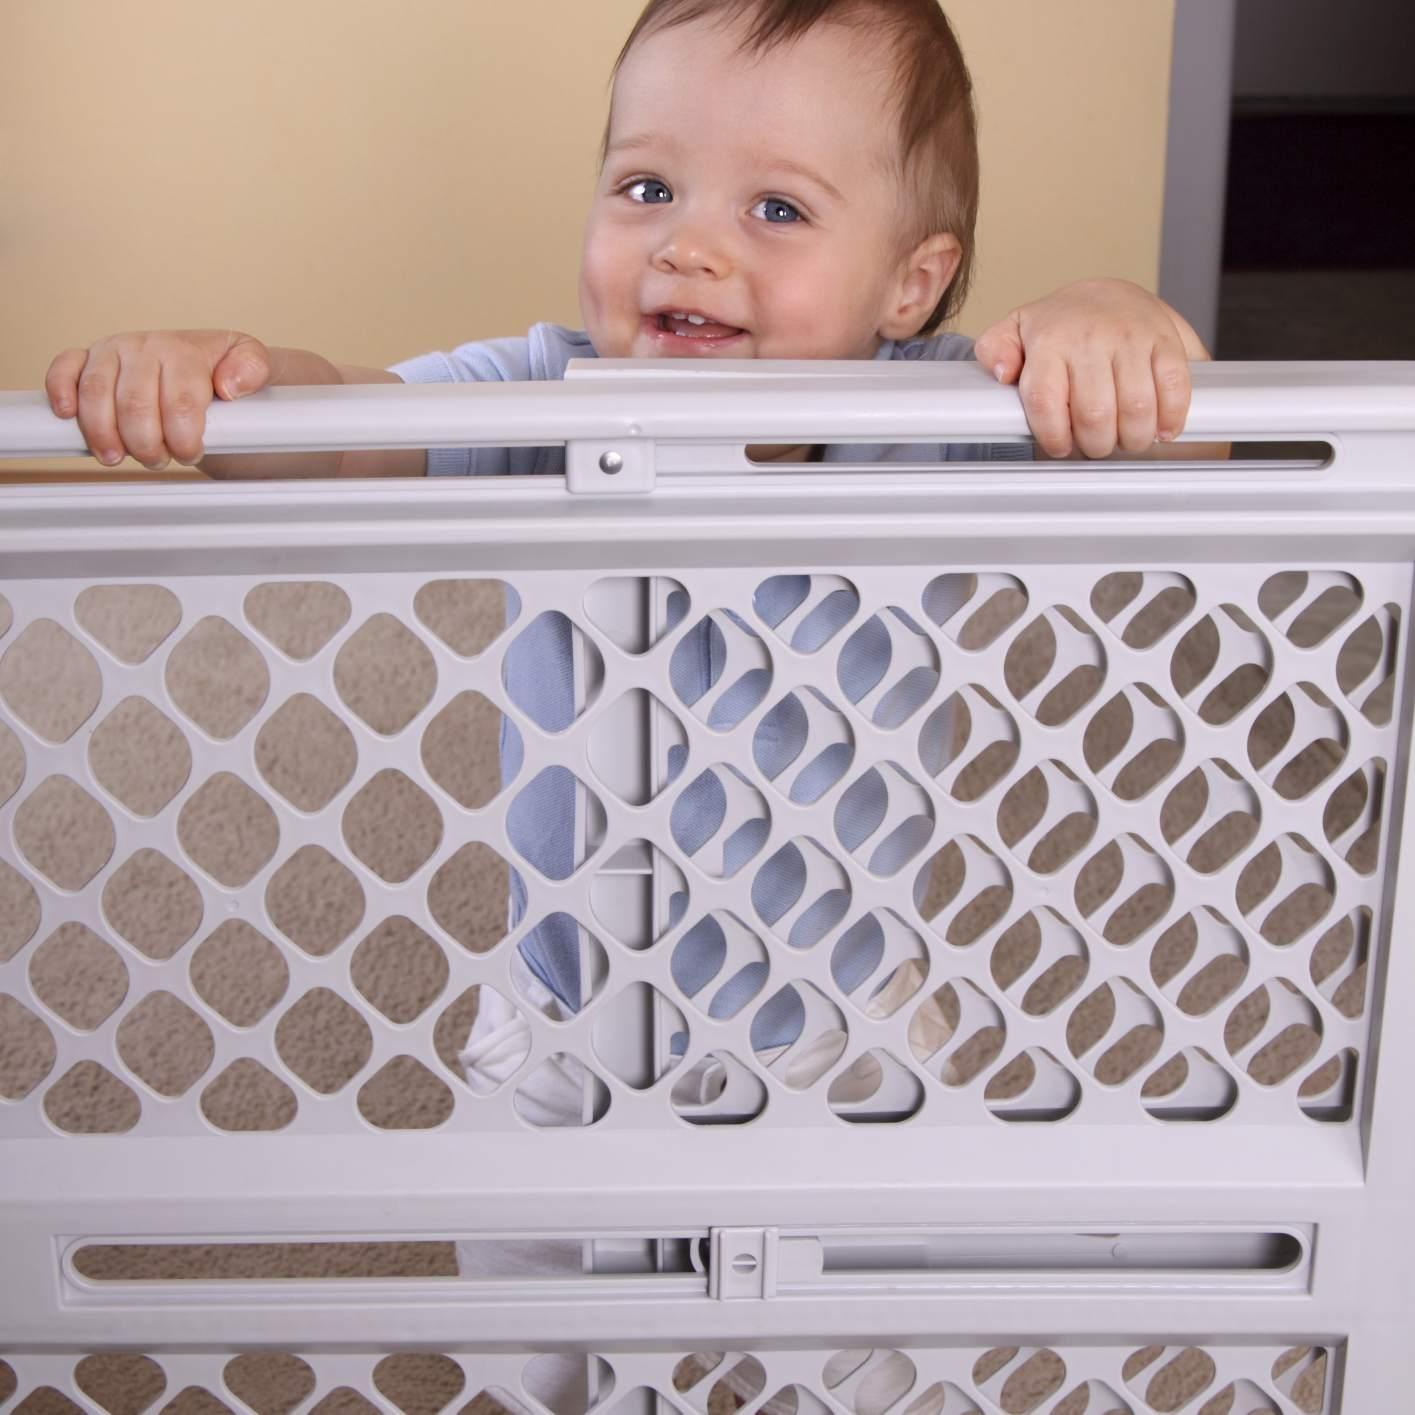 Toddler standing behind baby gate.